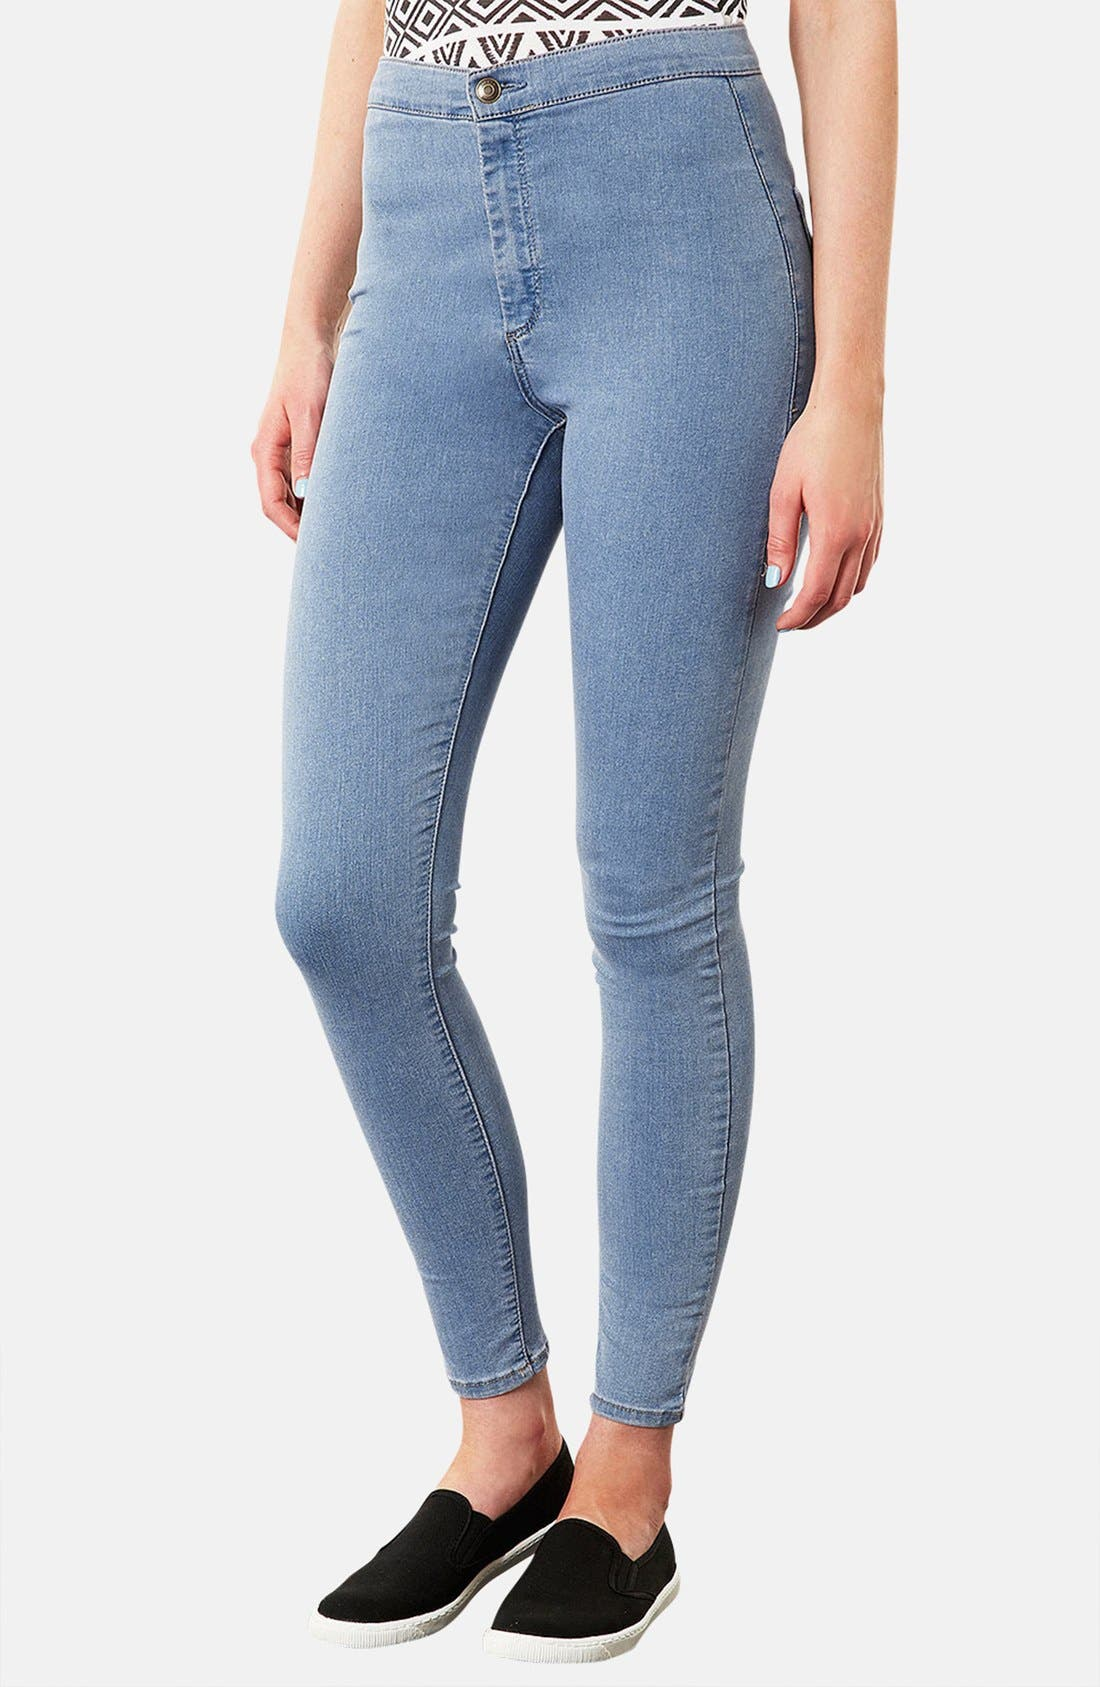 Alternate Image 1 Selected - Topshop Moto 'Joni' High Rise Skinny Jeans (Mid Stone)